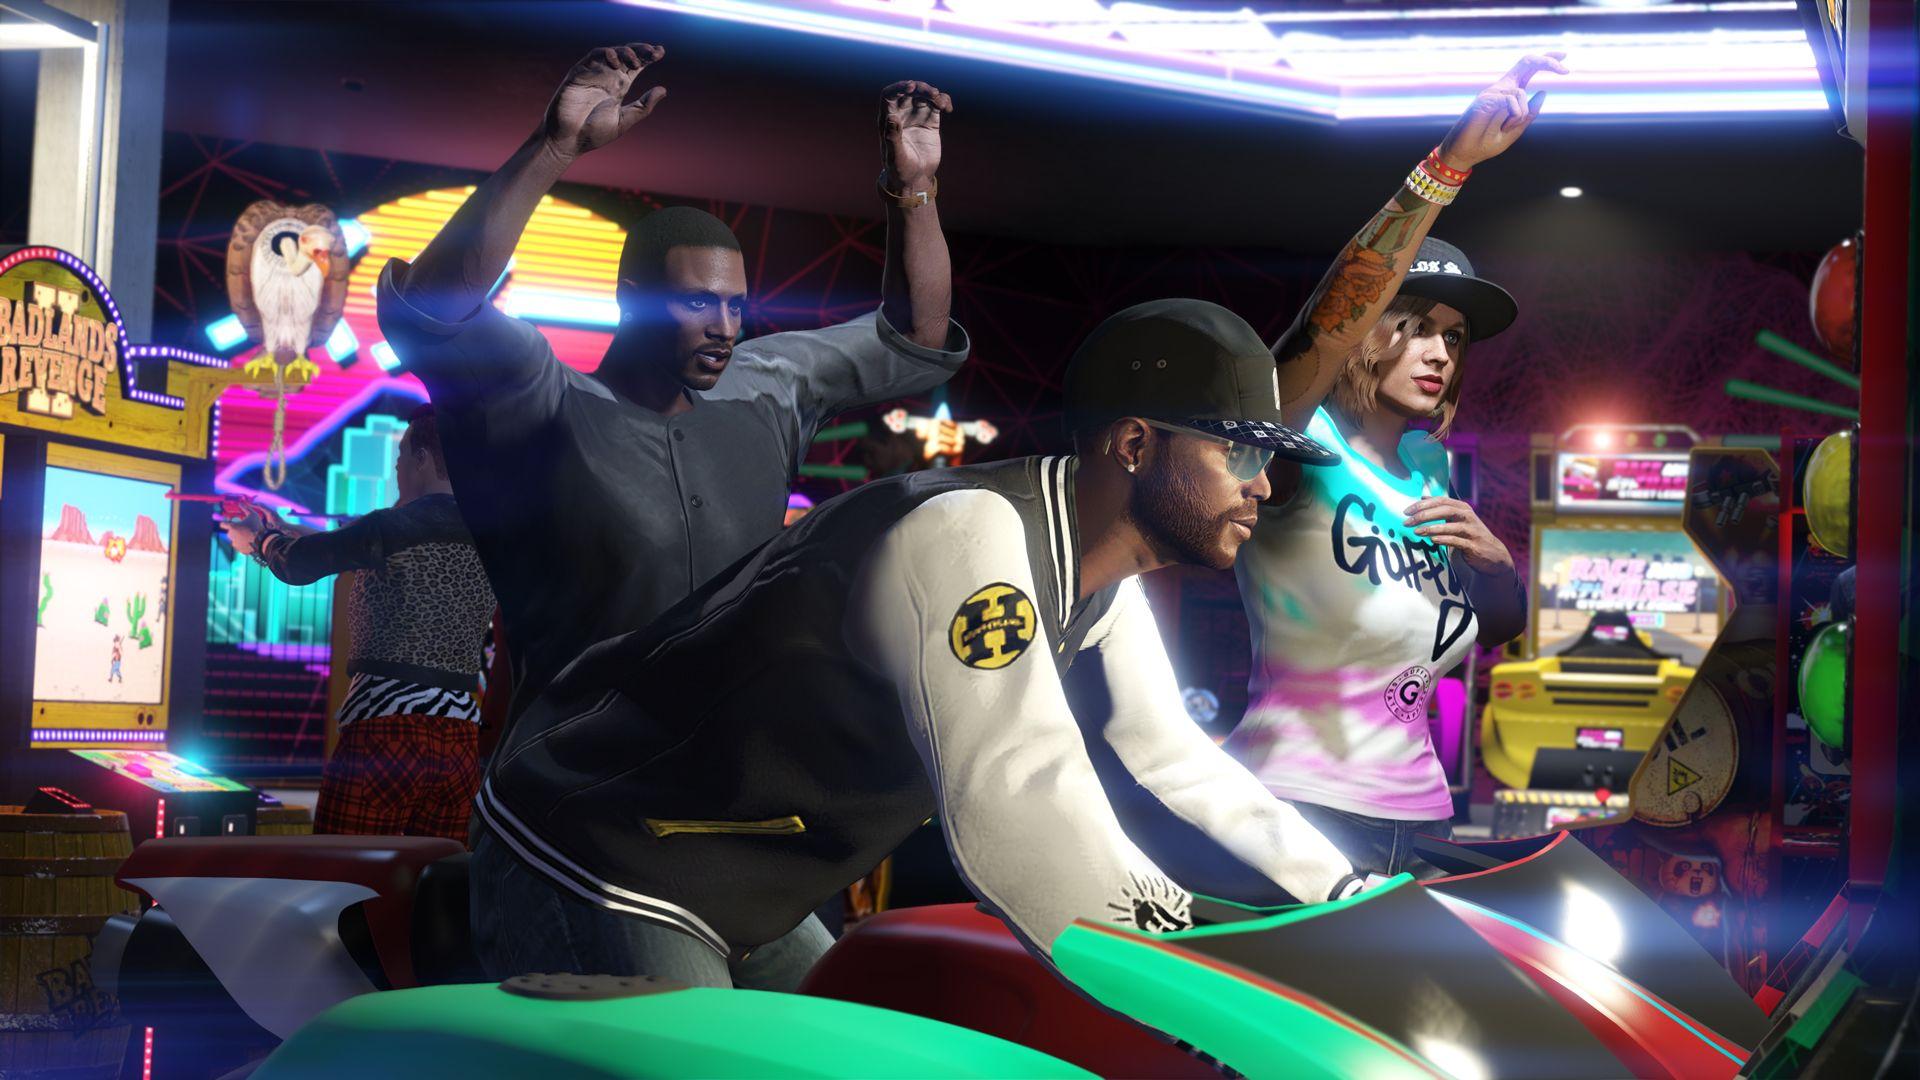 Rockstar Releases The Diamond Casino Heist For Gta V Online Gta Online Gta Play Gta Online Gta v diamond casion heist wallpaper